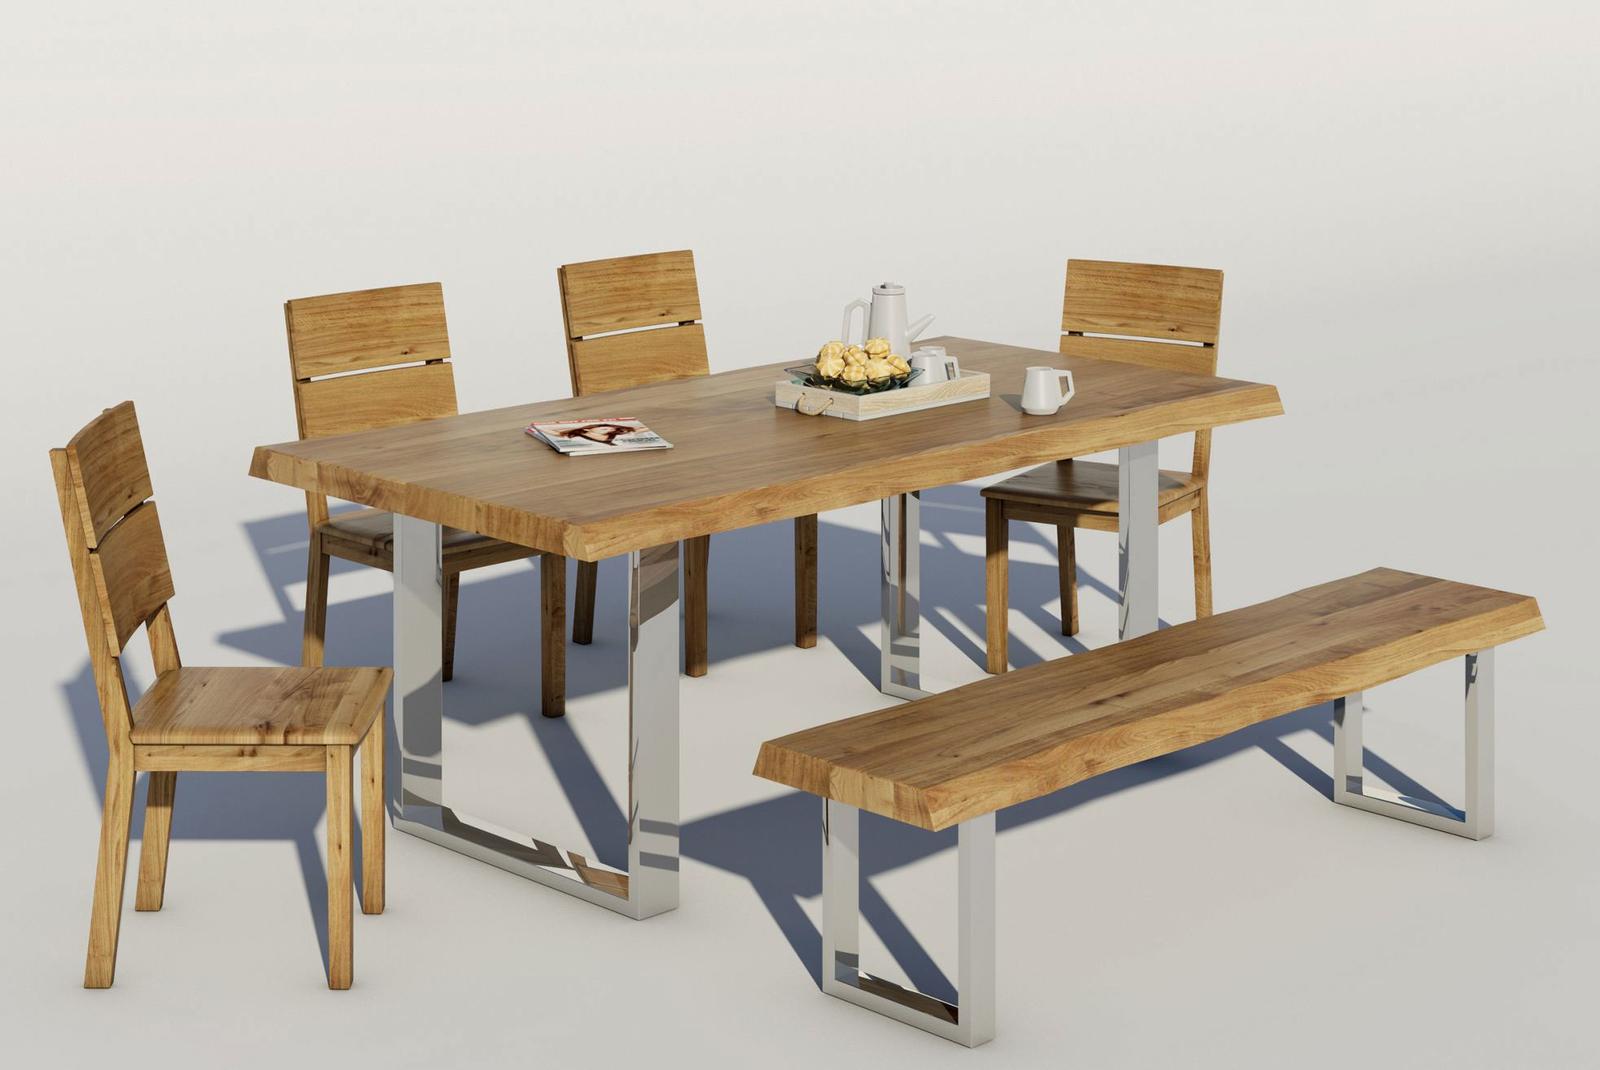 Massivholz Sitzbank Baumkante mit Chromgestell, Bild 2